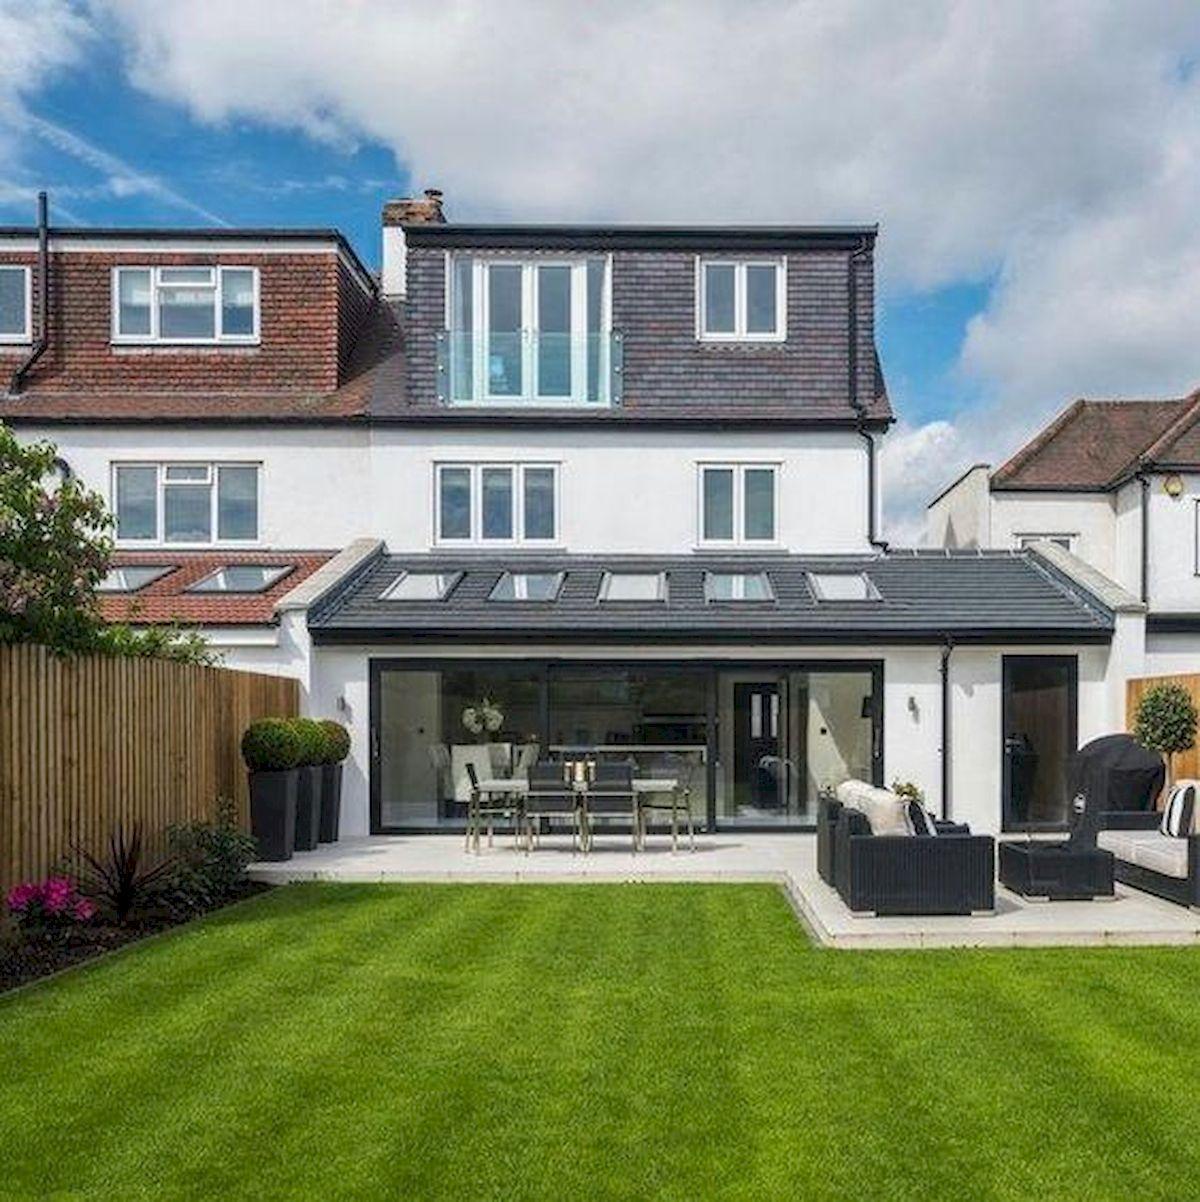 40 Fabulous Modern Garden Designs Ideas For Front Yard And Backyard Roof Garden Design Pl In 2020 House Extension Design Garden Room Extensions House Extension Plans